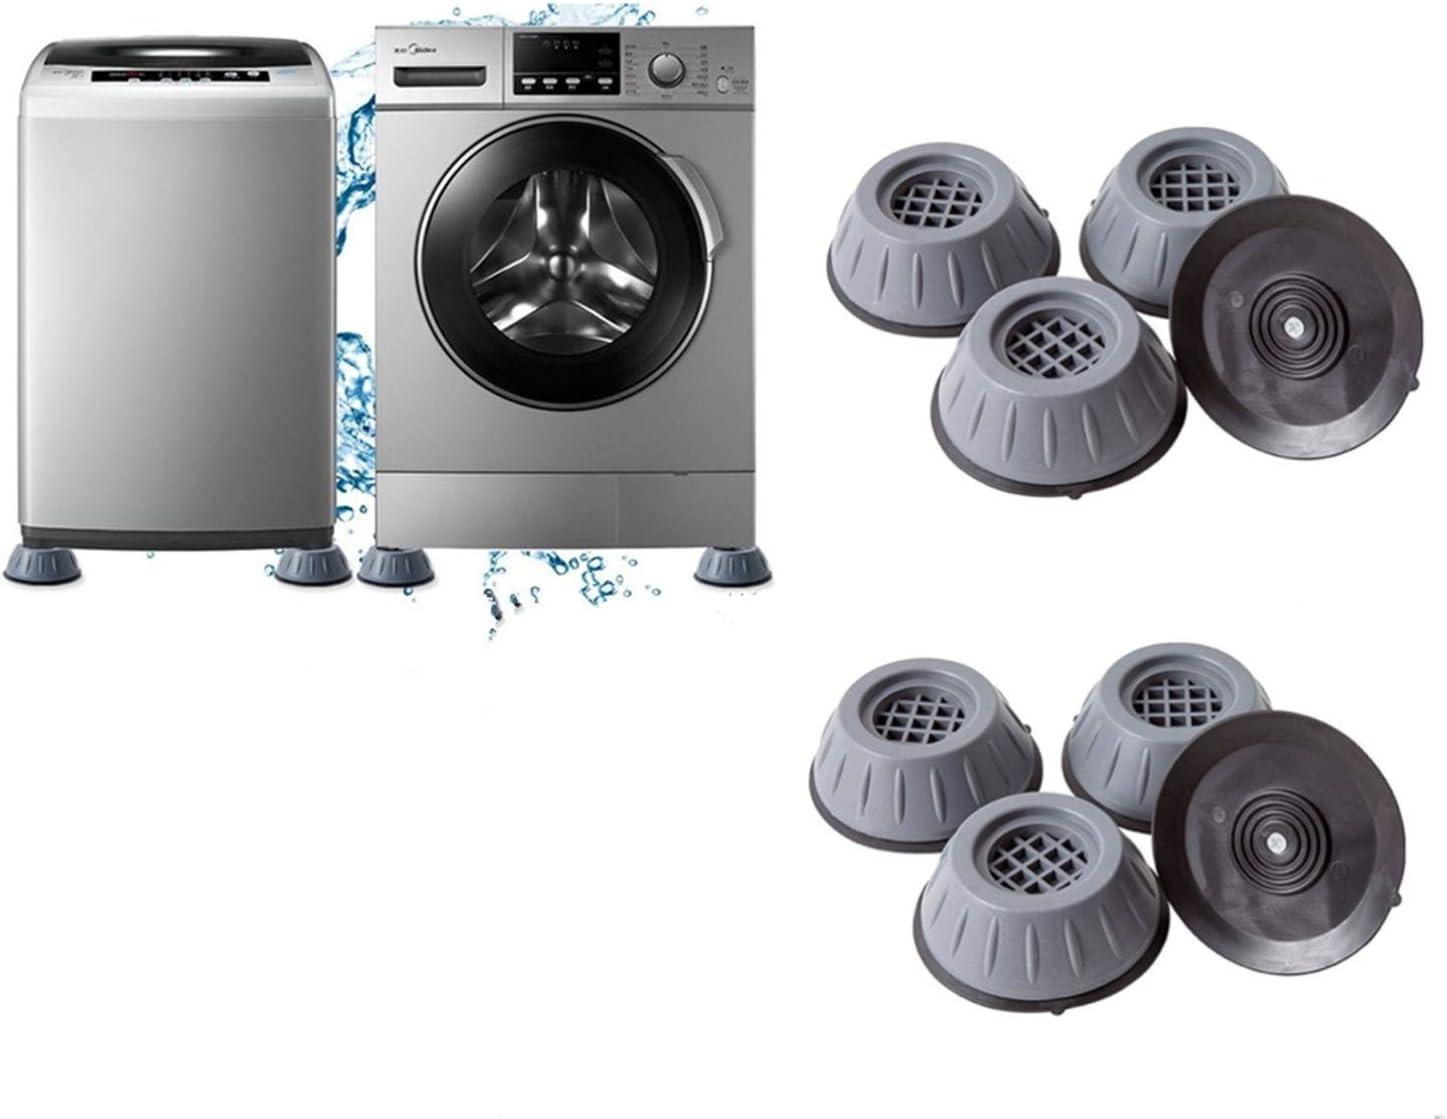 Shock and Noise Cancelling Washing Machine Support Washer Dryer Anti Vibration Anti-Walk Foot Pads Anti Slip Fridge Bed Leveling Mat Isolation Rubber Feet Mat Protection Against Walking Reduce Shaking